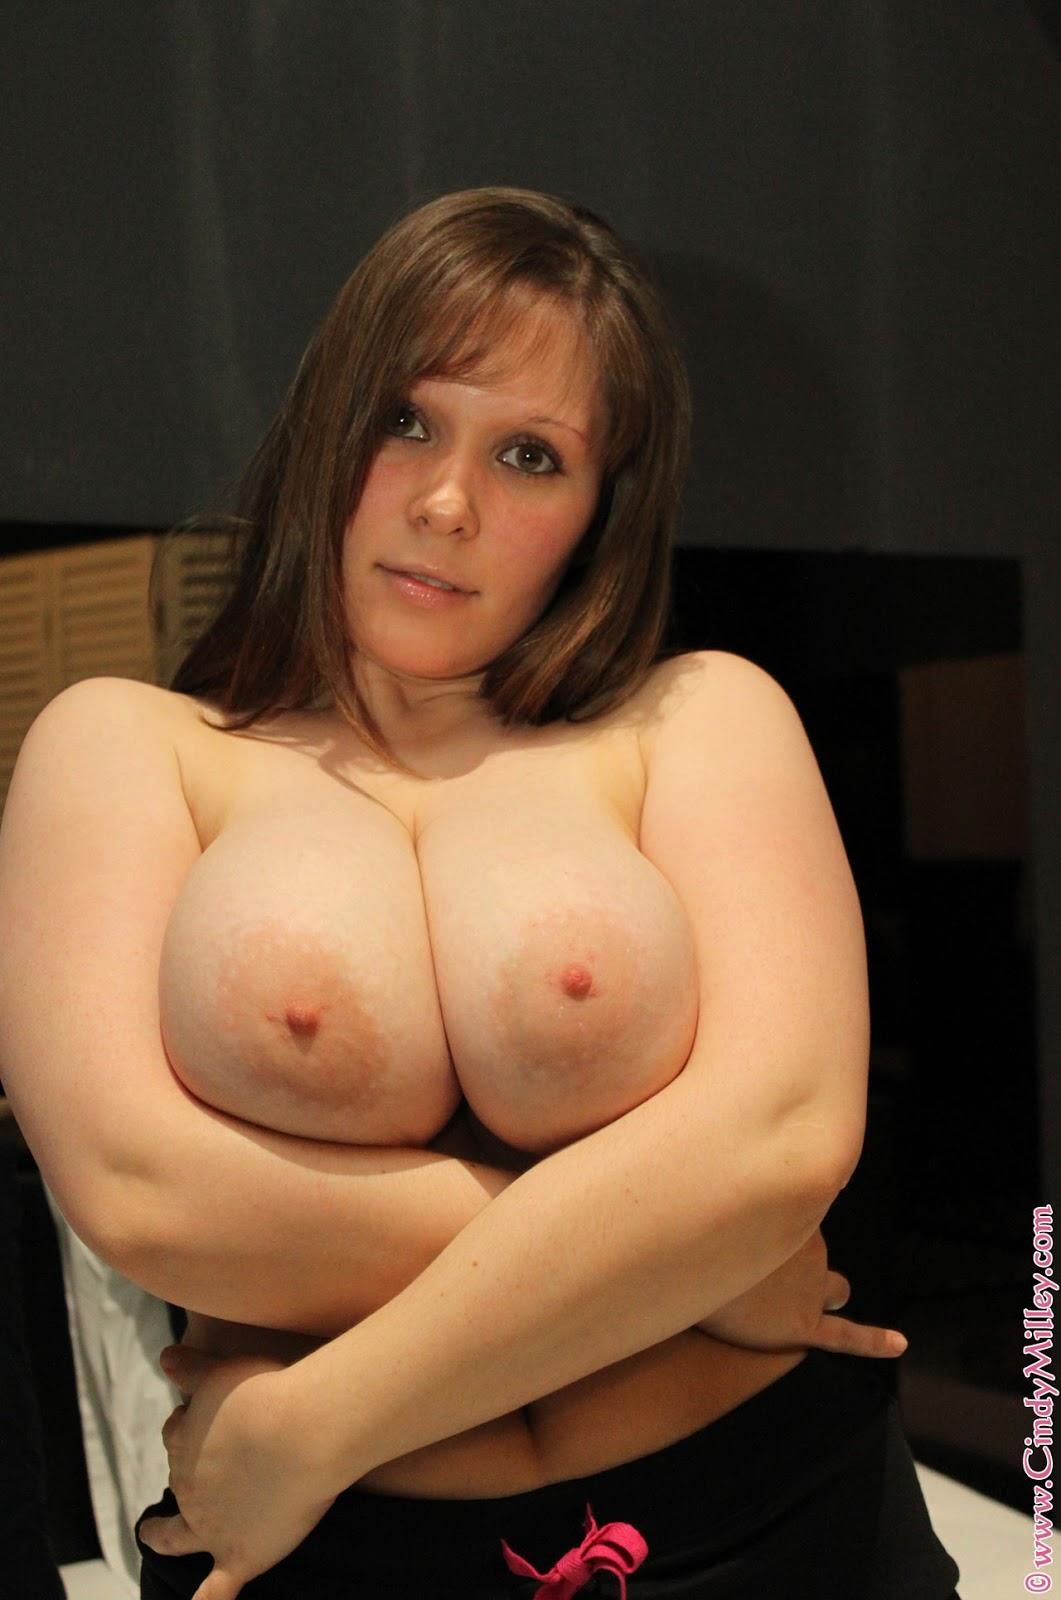 Cindy Milley - 30H big Boobs